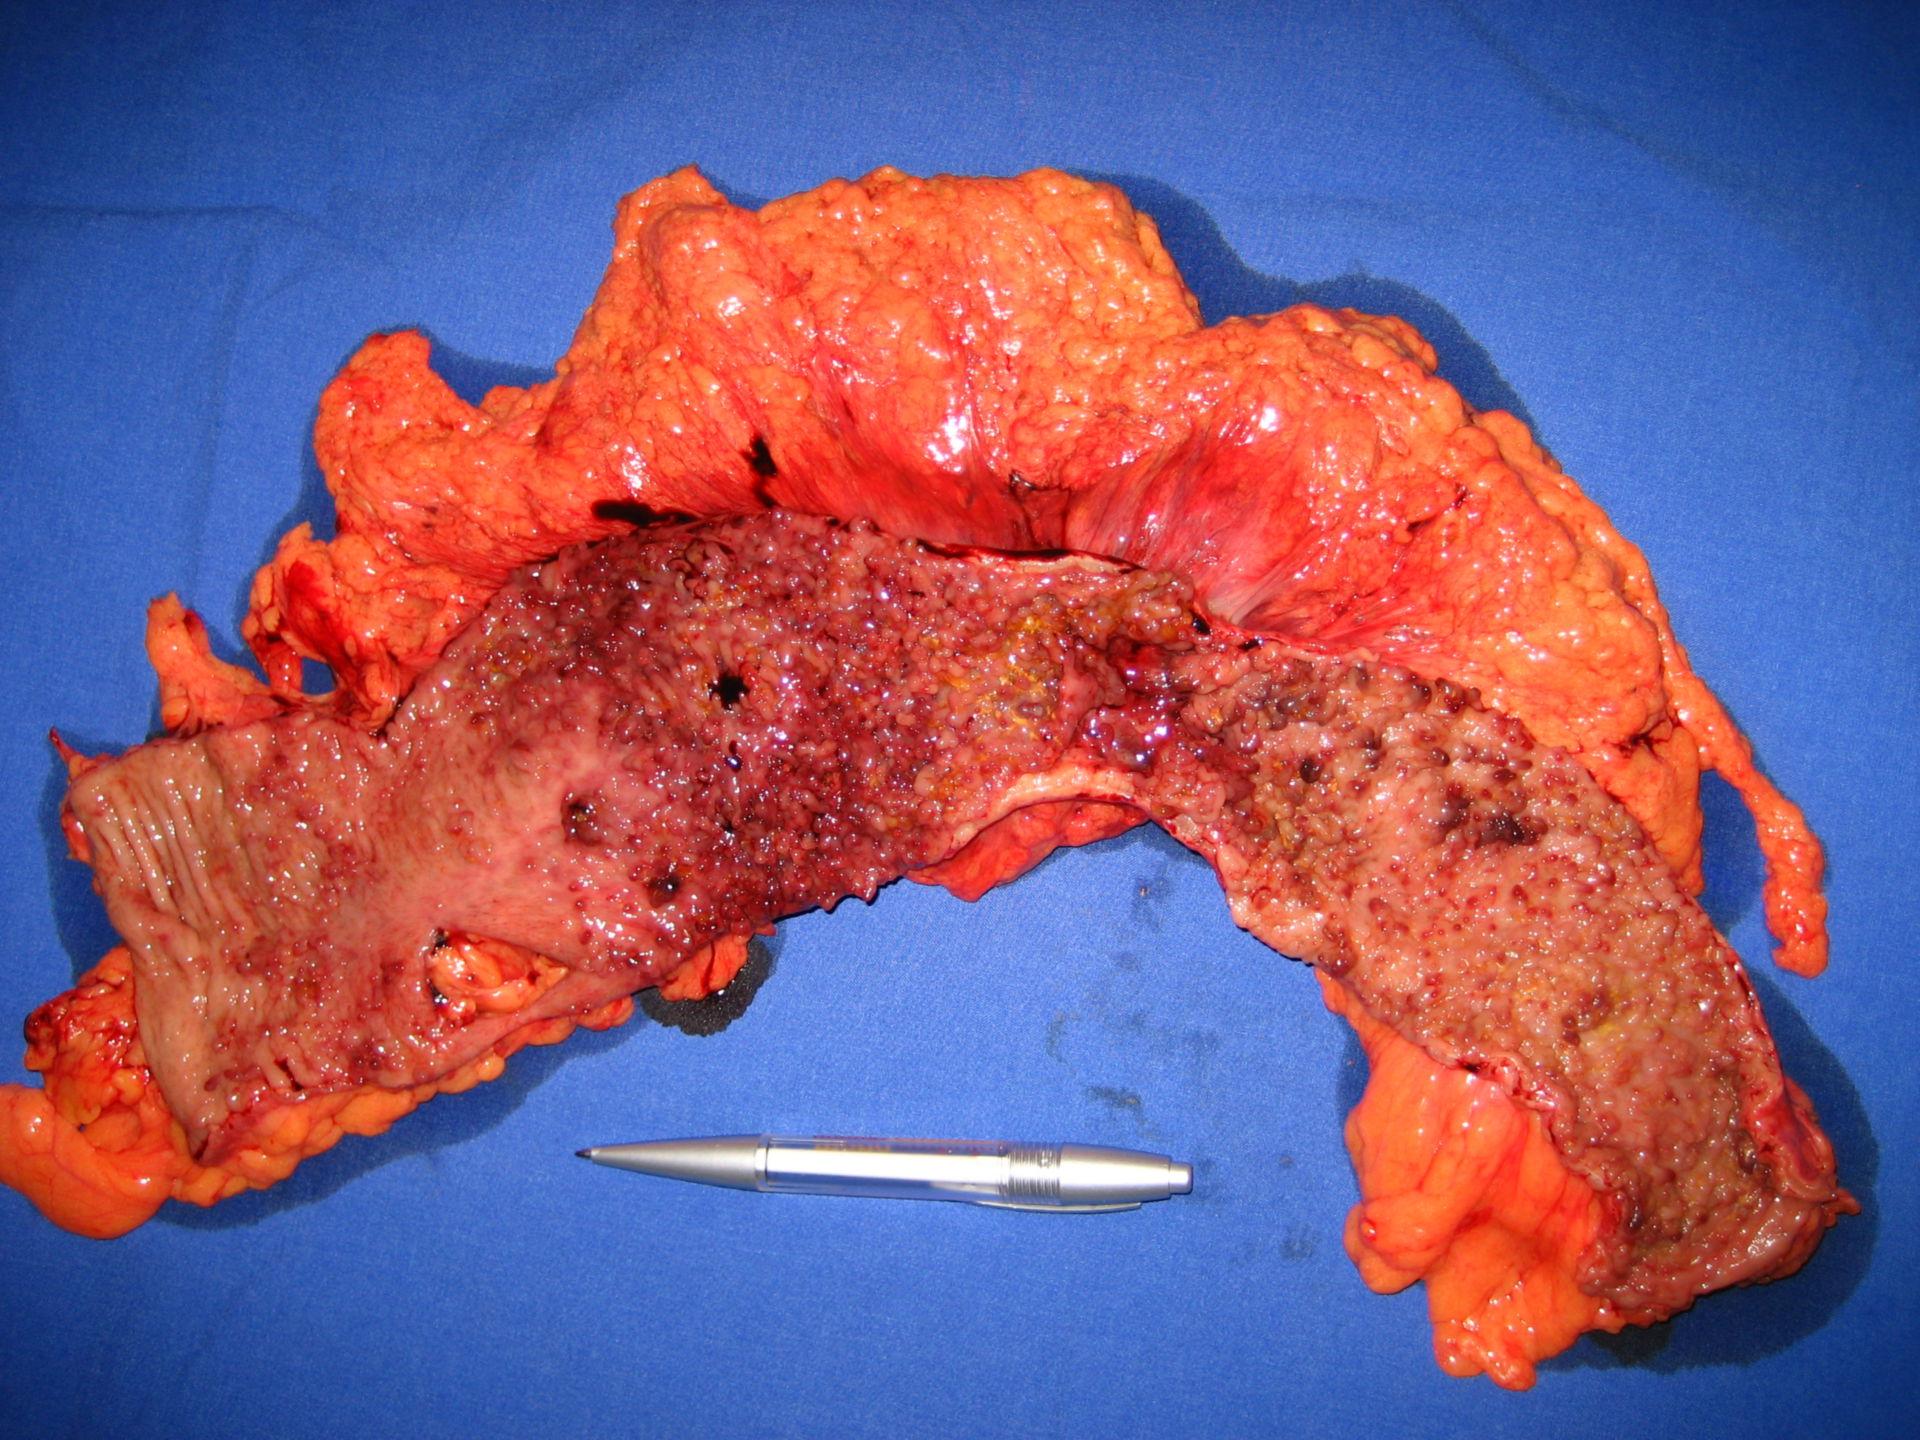 Crohn's disease - large intestines